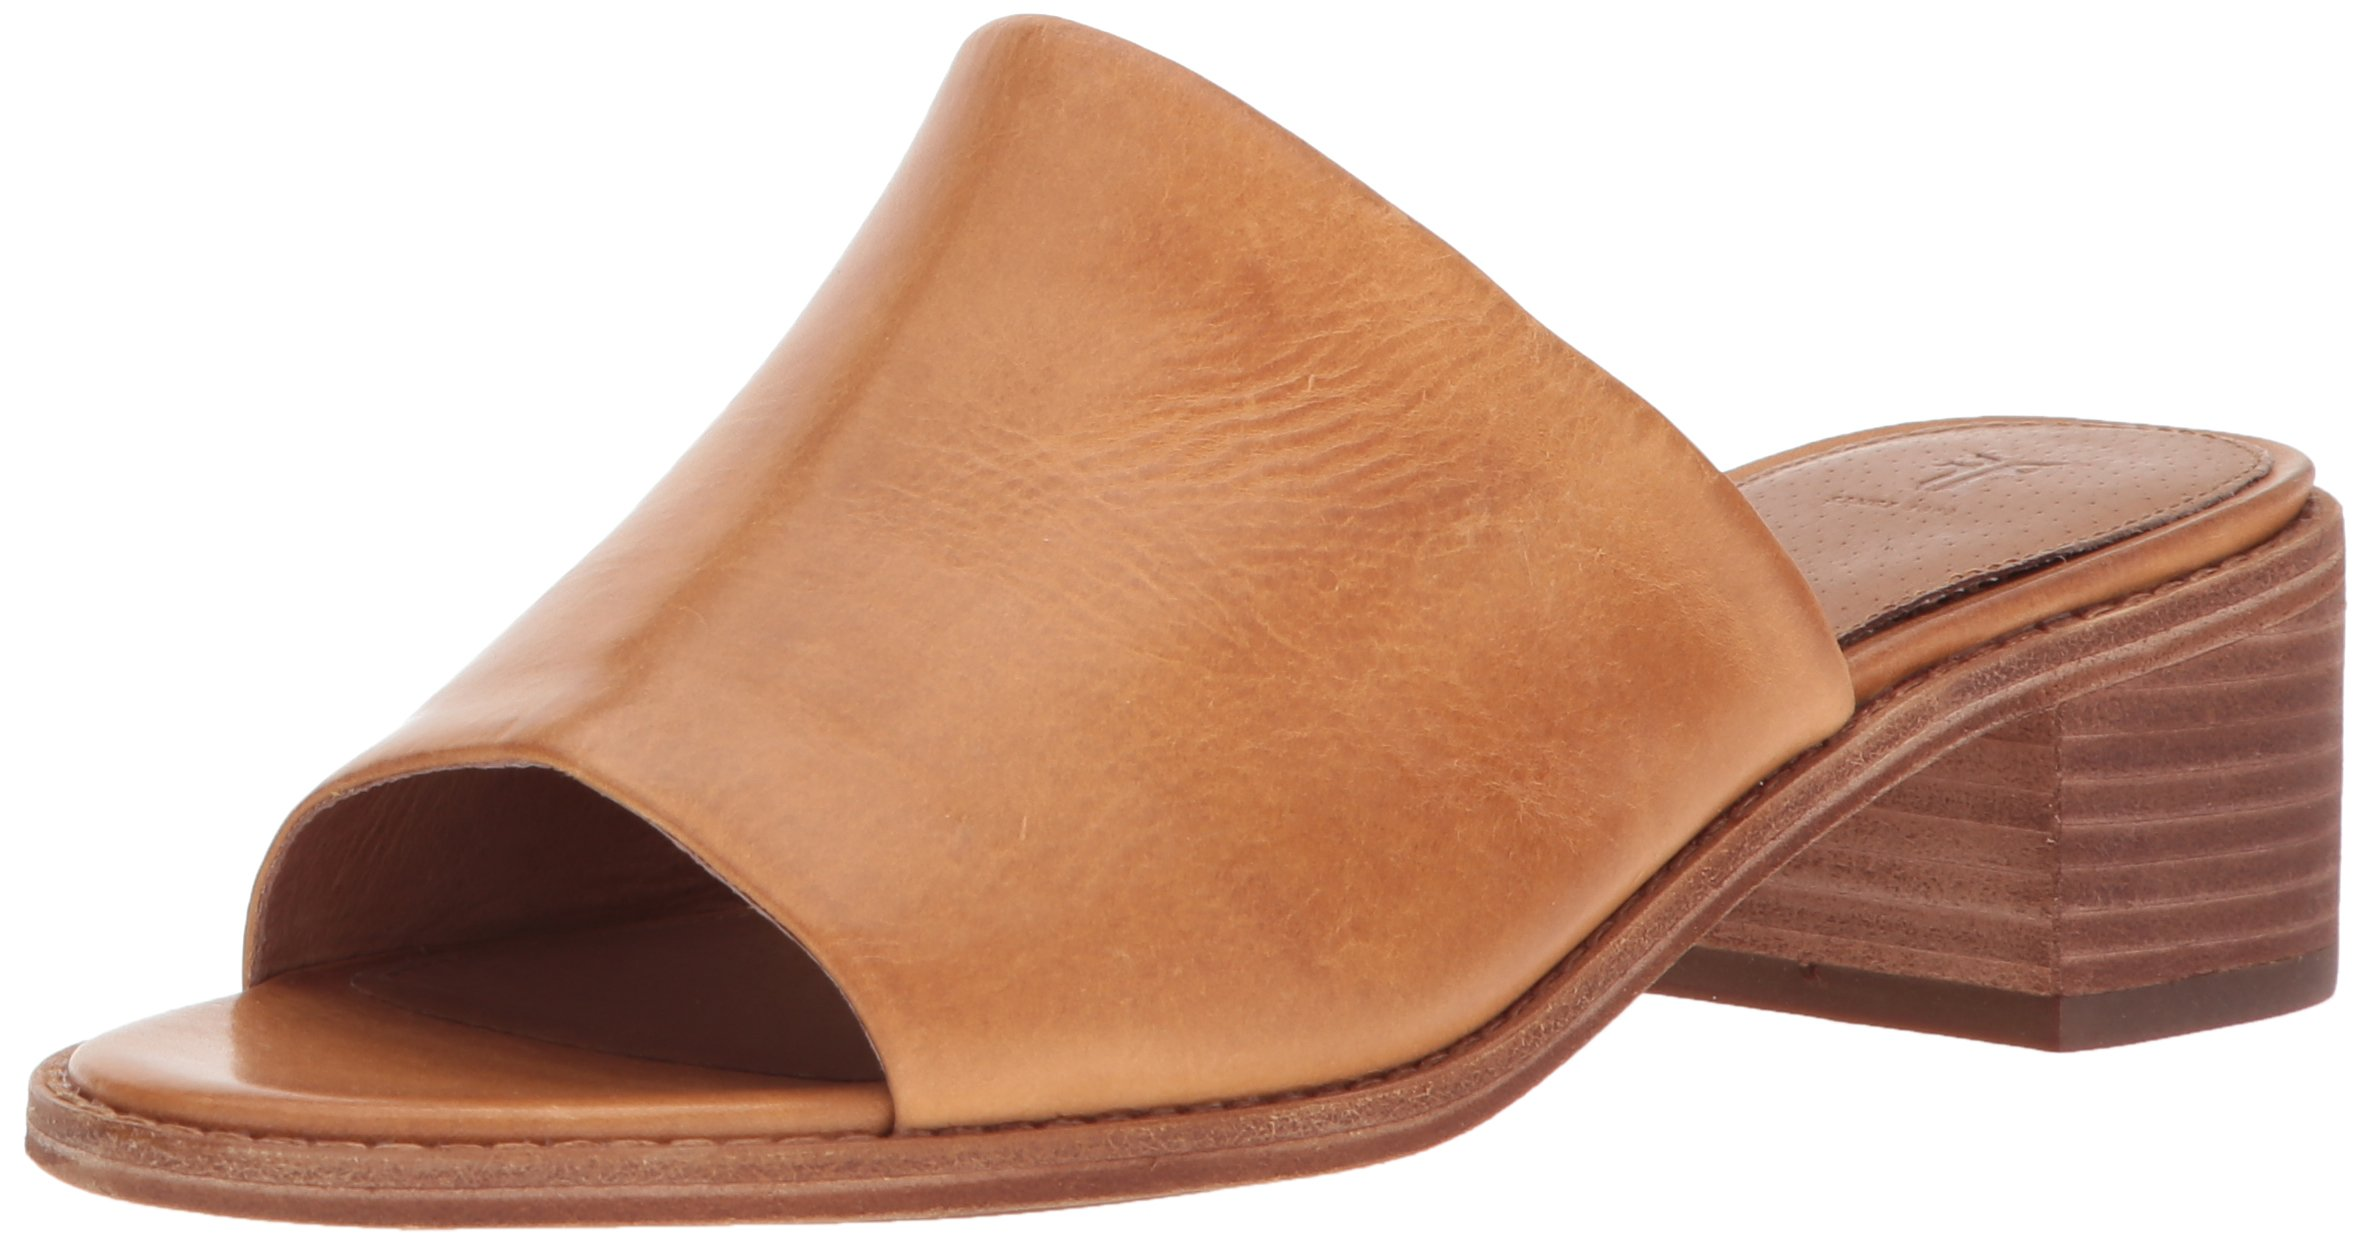 FRYE Women's Cindy Mule Heeled Sandal, Natural, 7.5 M US